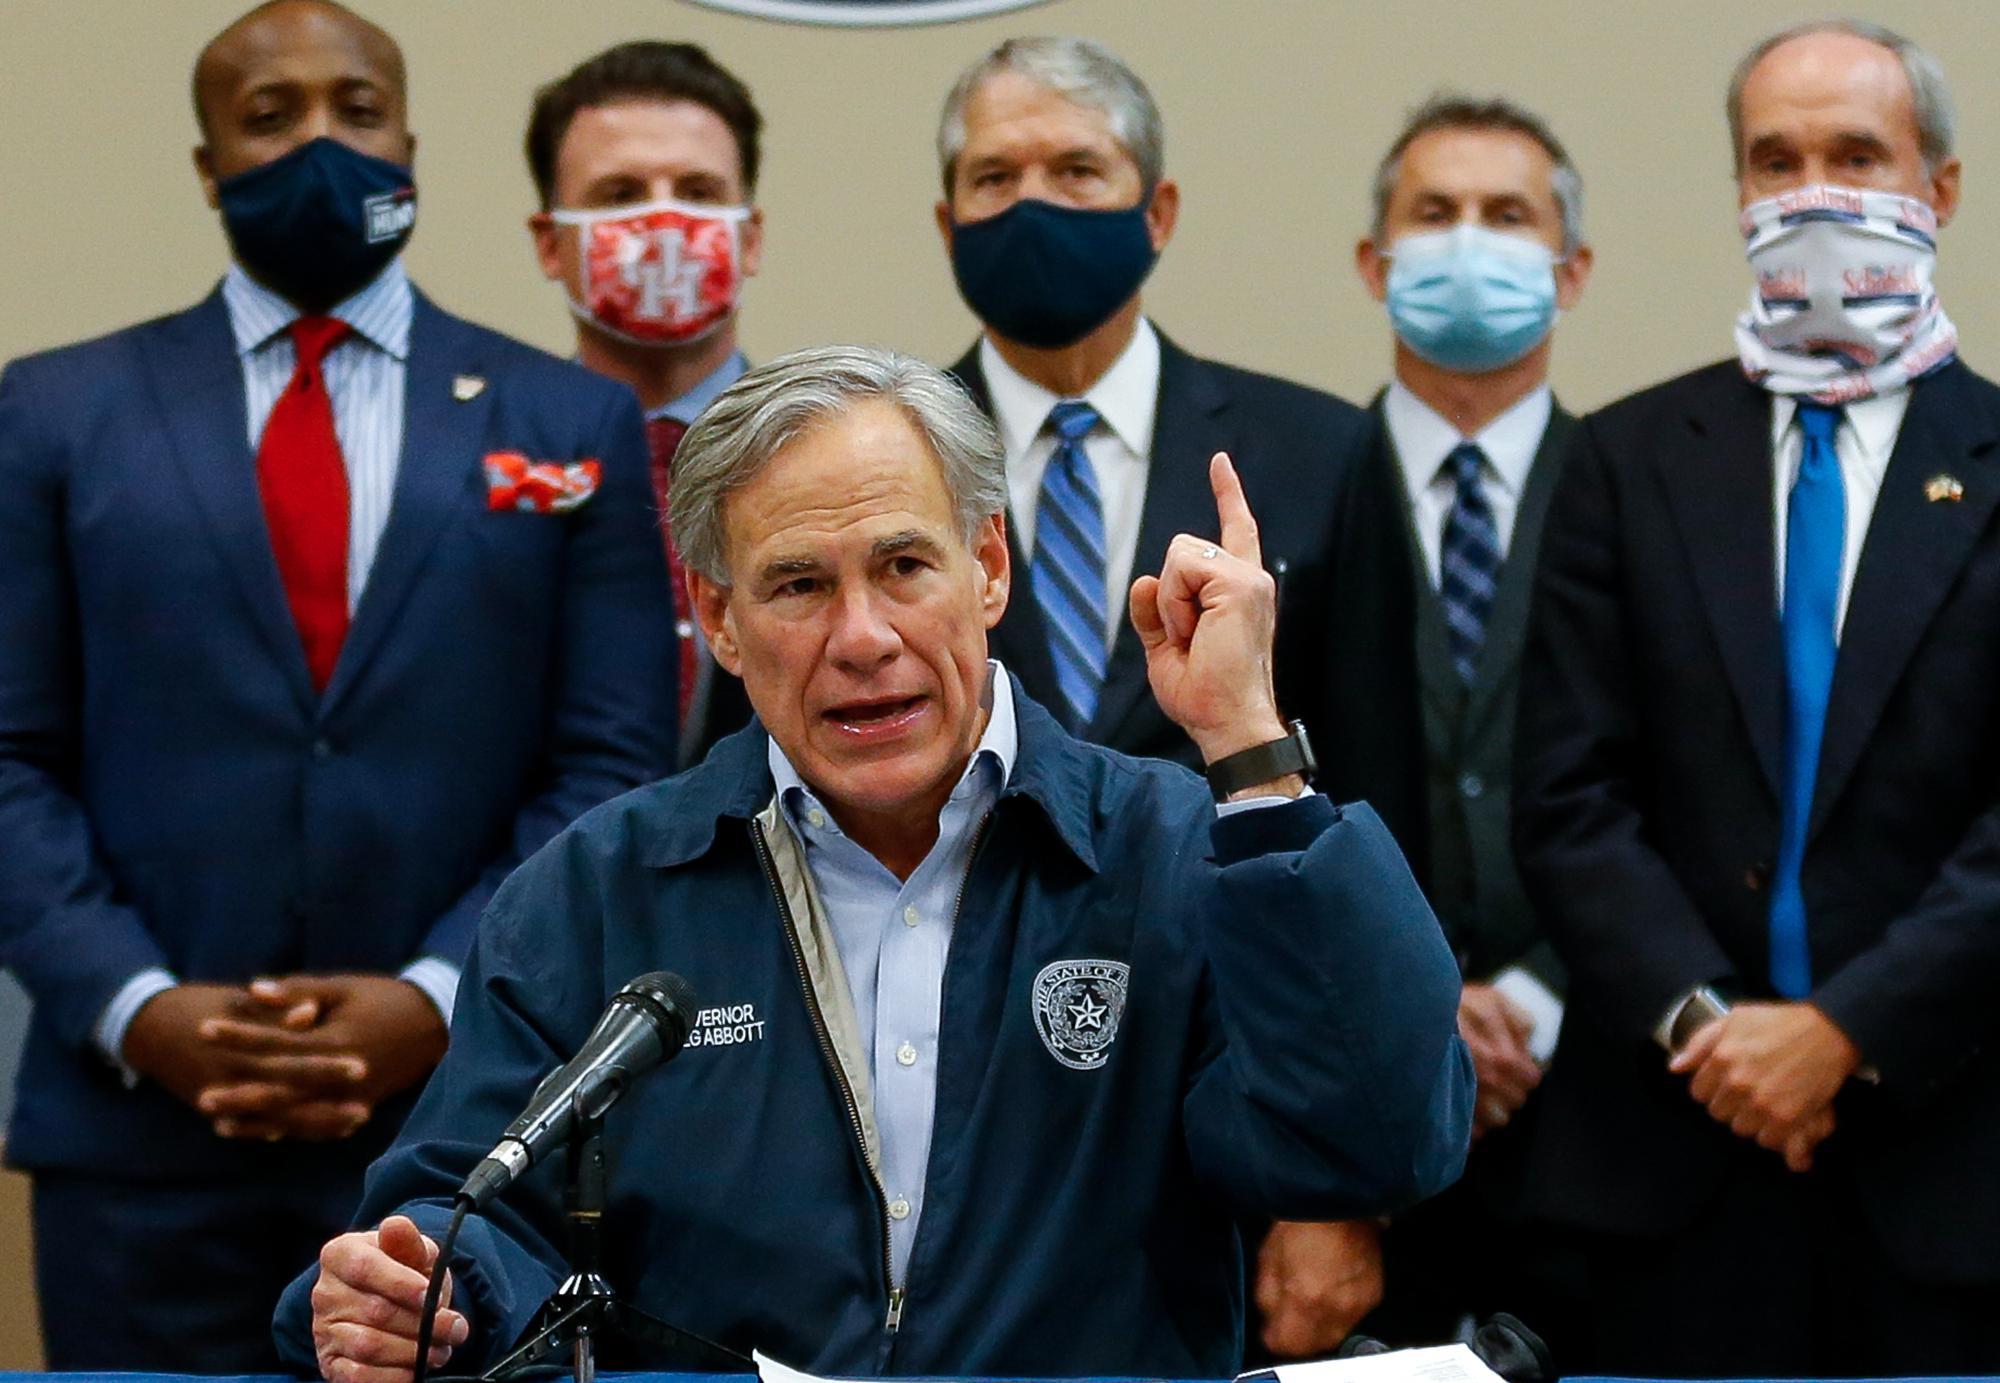 Abbott's COVID rollbacks were 'like PTSD' for Houston doctors, health experts